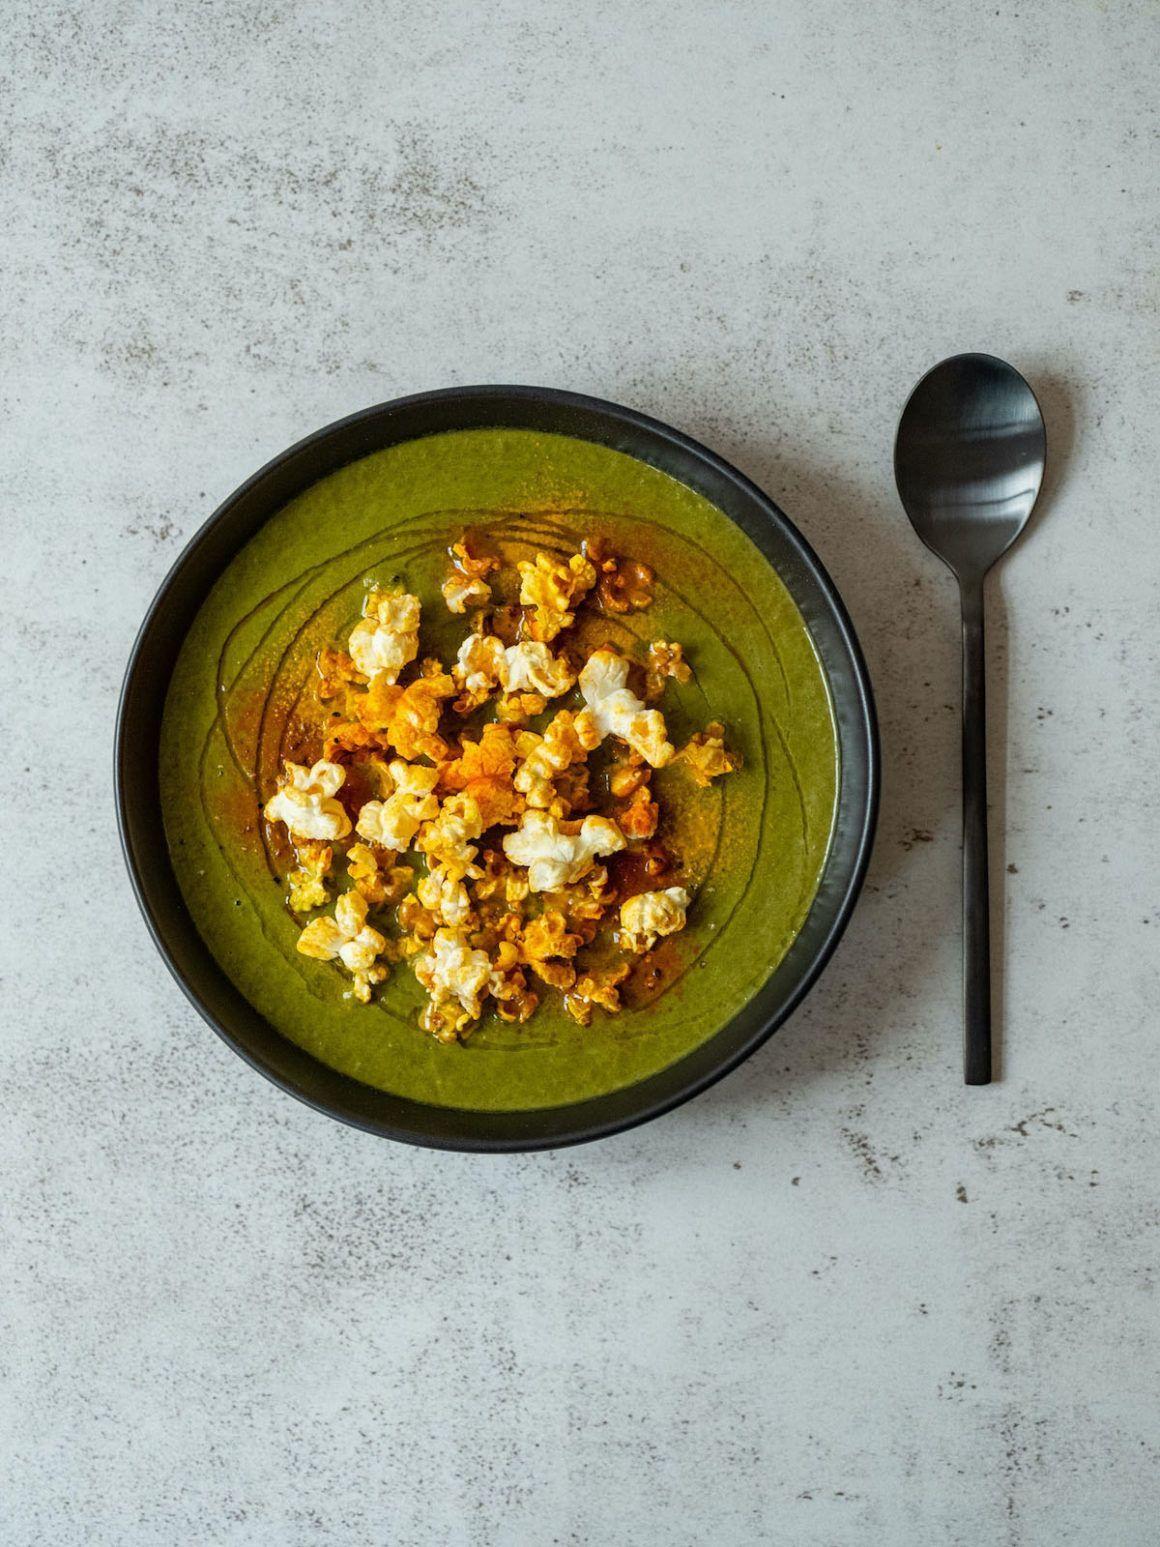 About Fuel, Rezept, Spinatsuppe, Gewürzpopcorn, Mais Popcorn, Paprikapulver, Foodblog